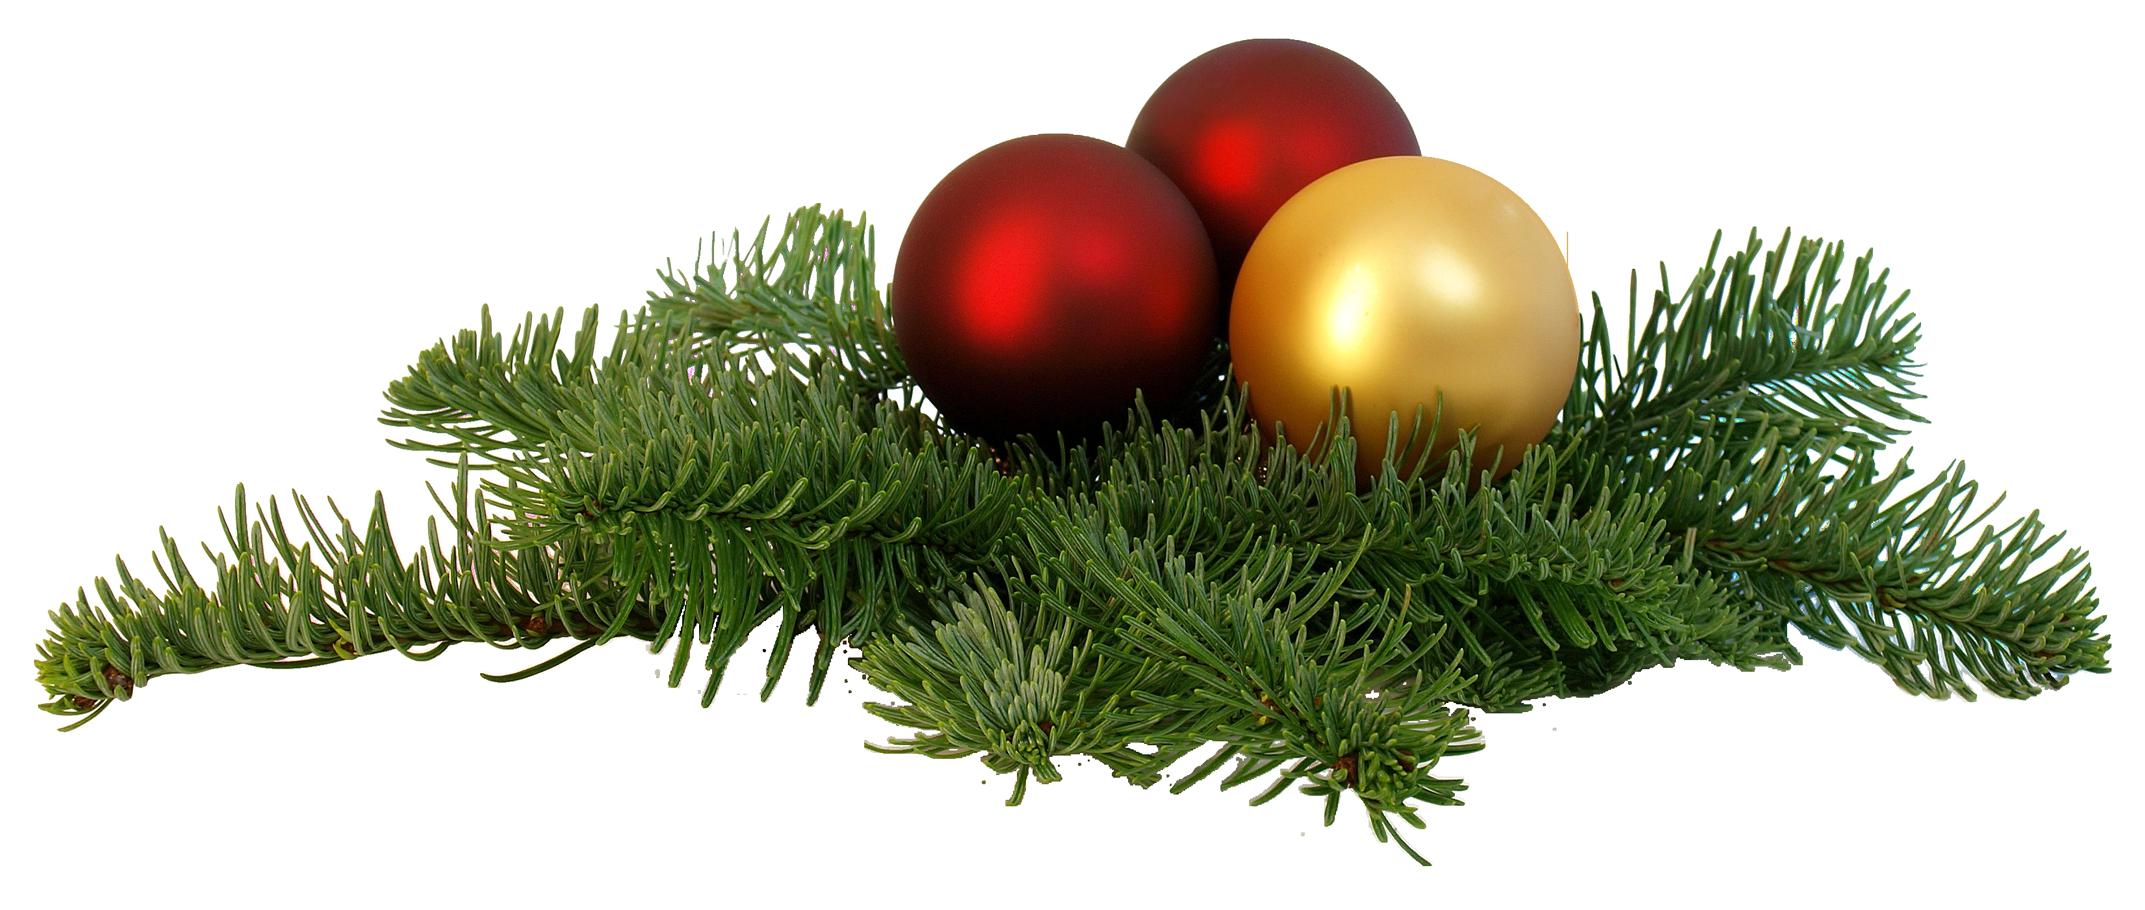 Christmas Branch Png.Christmas Branch Png Image Purepng Free Transparent Cc0